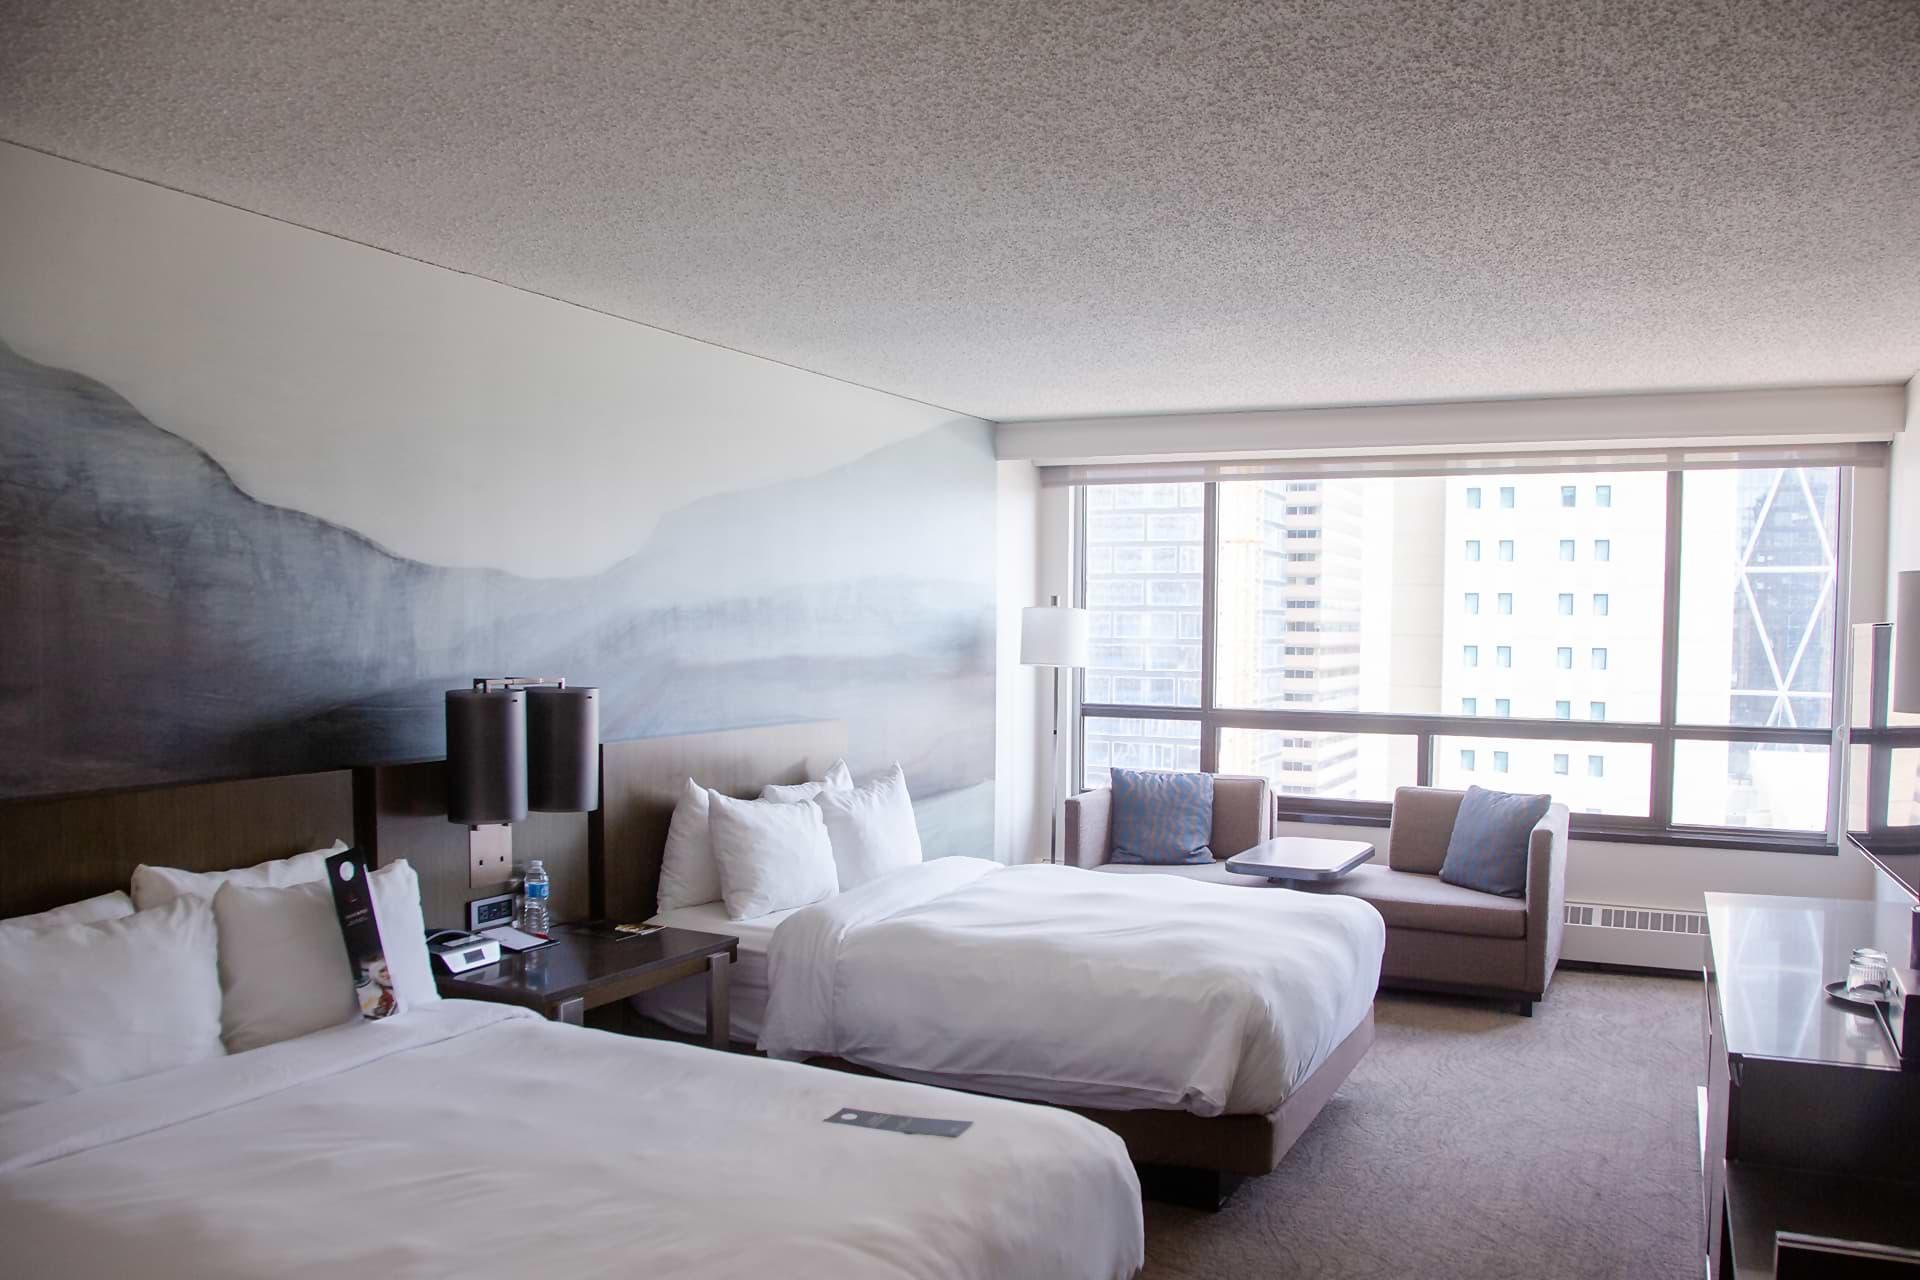 The Marriott Hotel